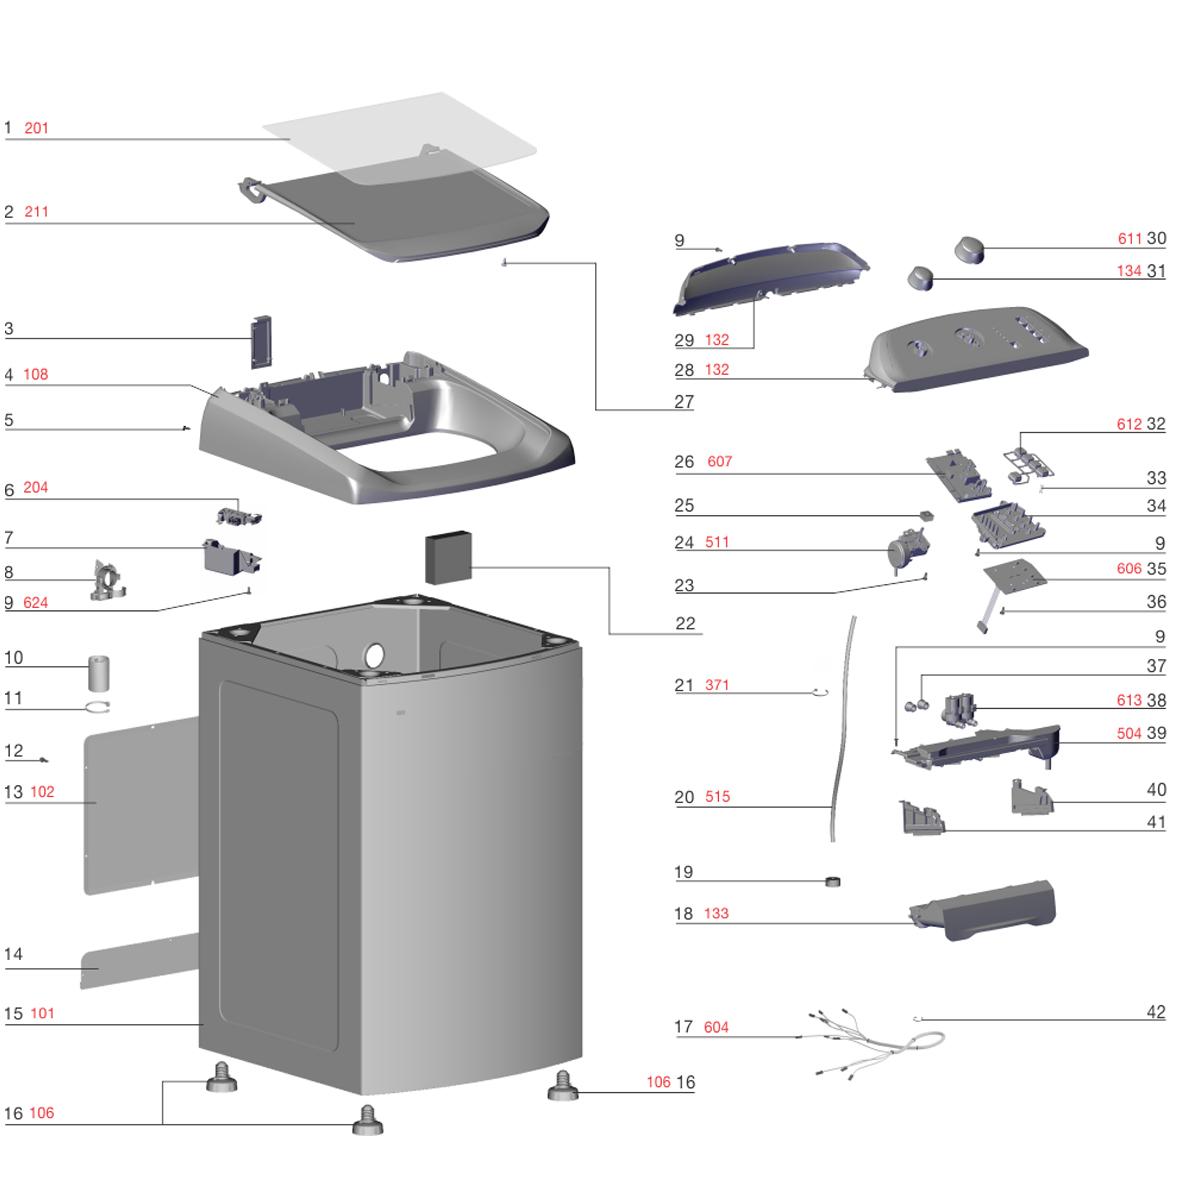 Placa Interface para Lavadora de Roupas Top Load Electrolux -  64503063